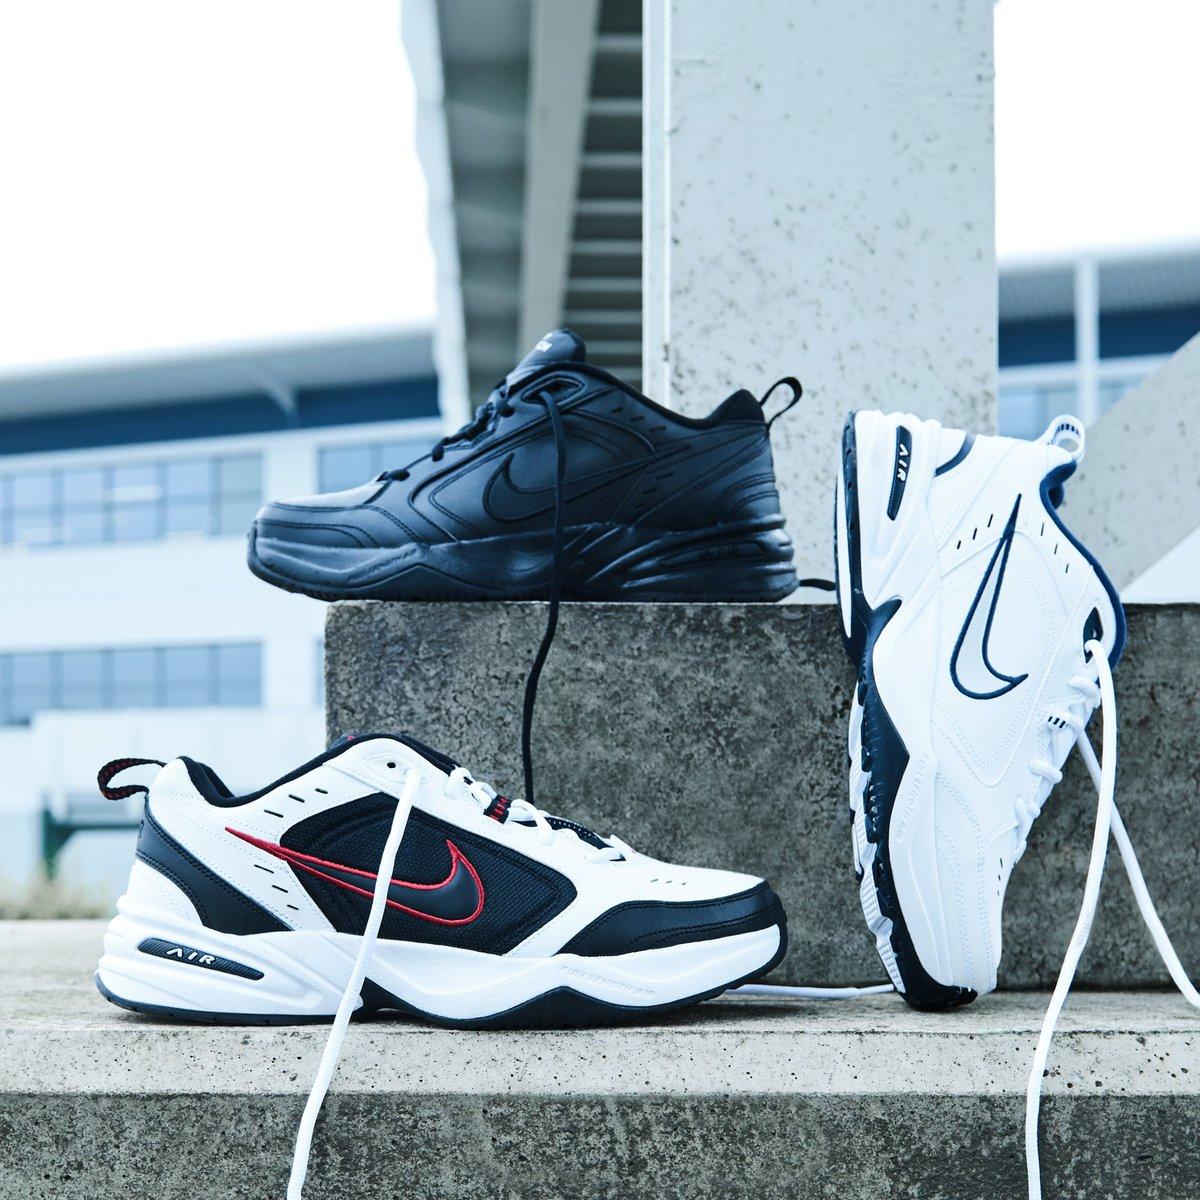 Nike Air Monarch trainers